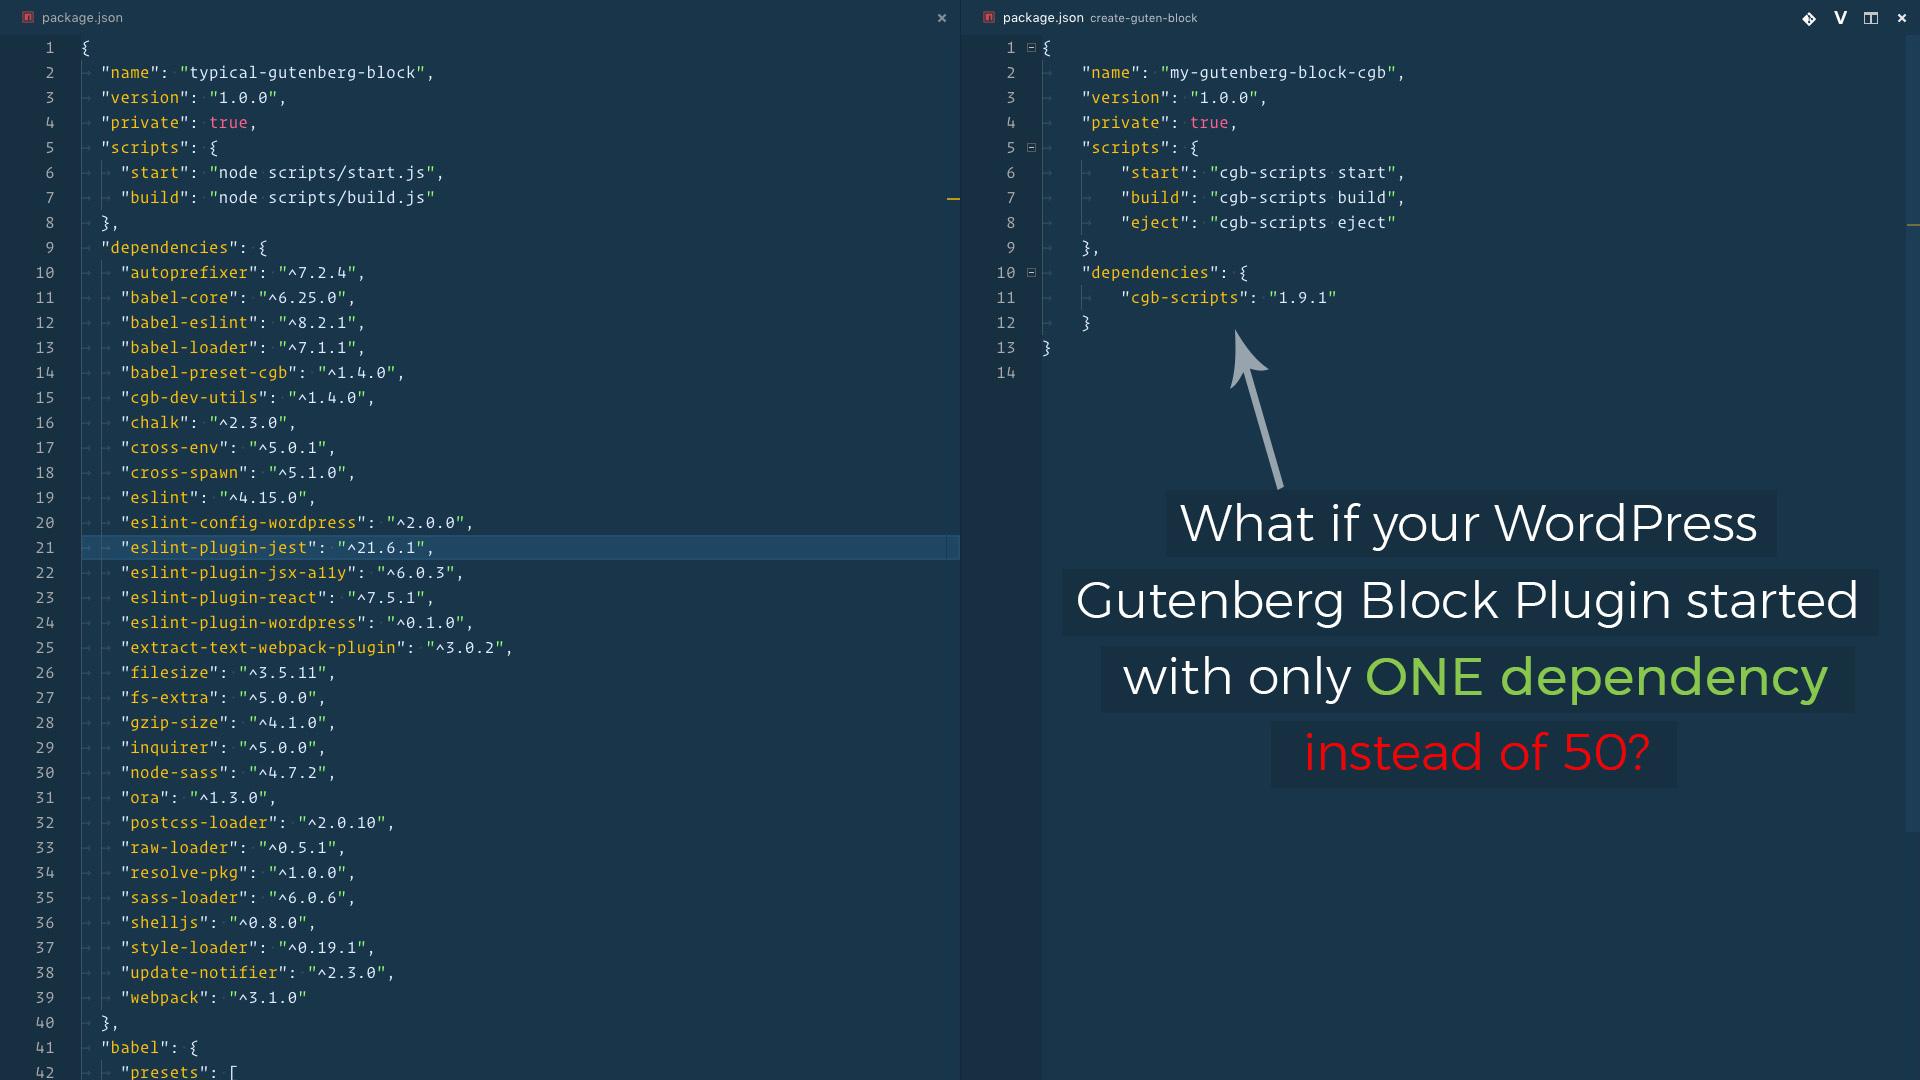 create-guten-block cgb-scripts